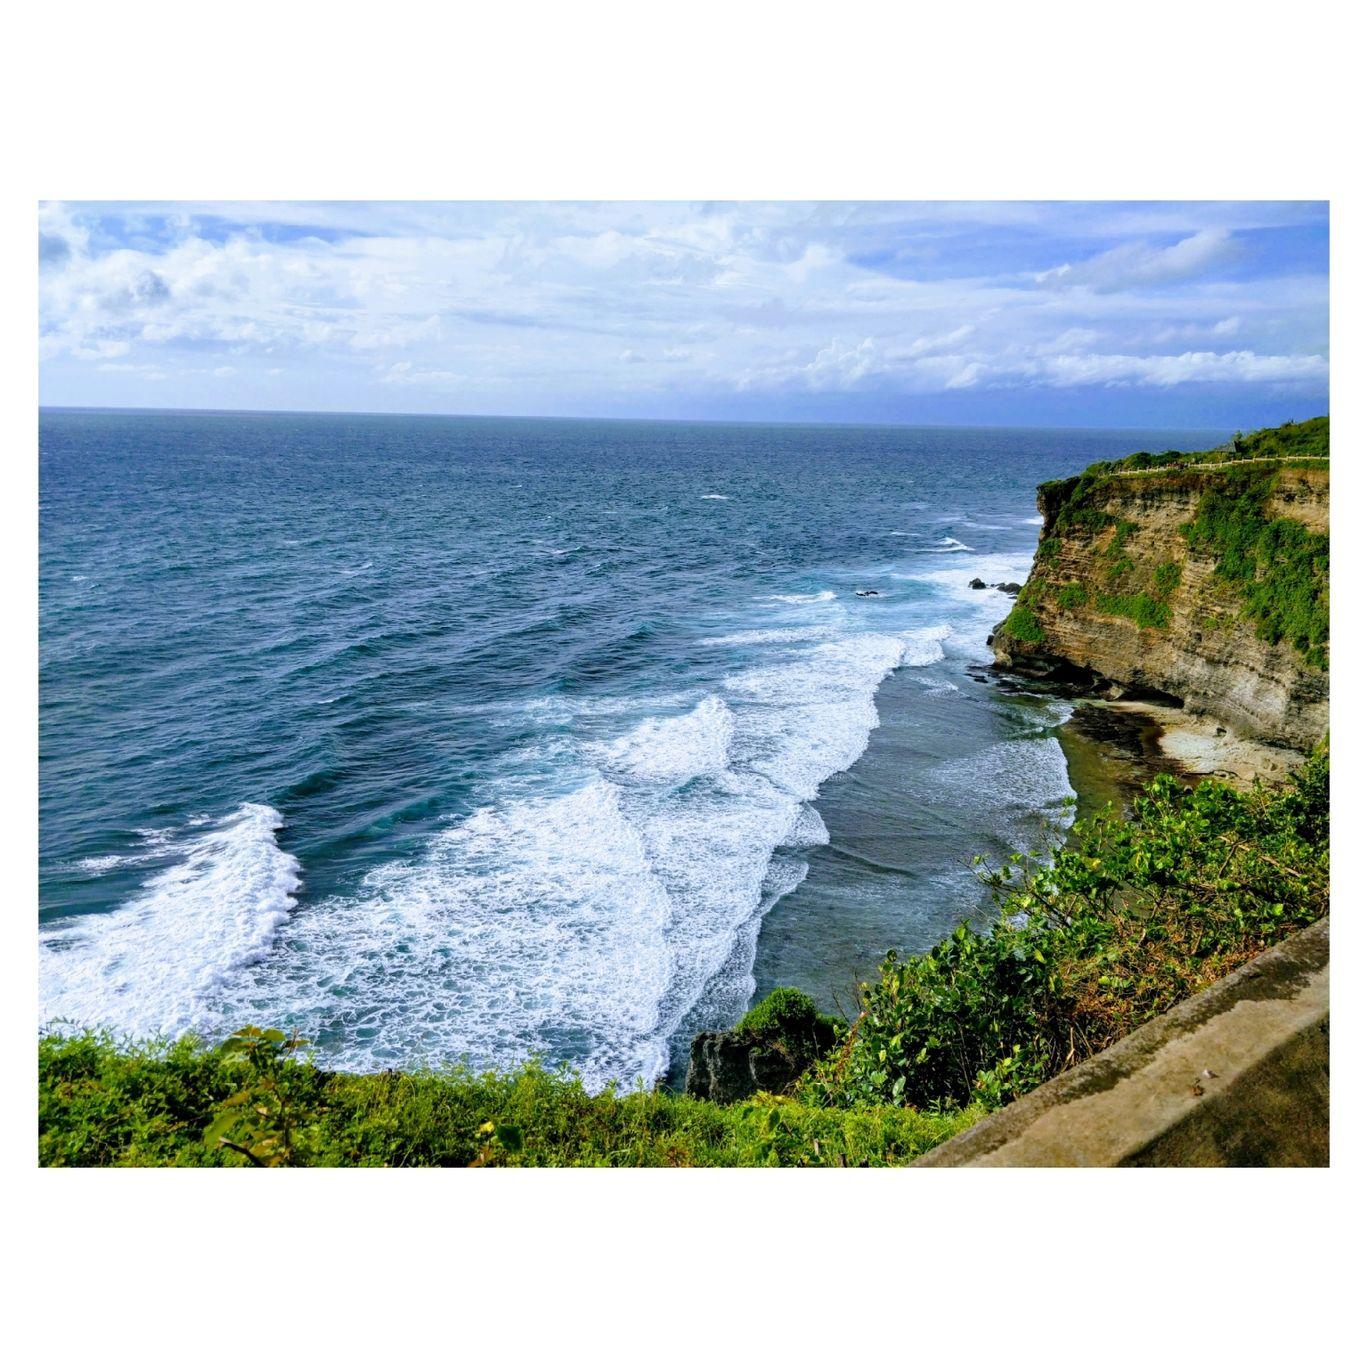 Photo of Bali By Anveshita Sharma